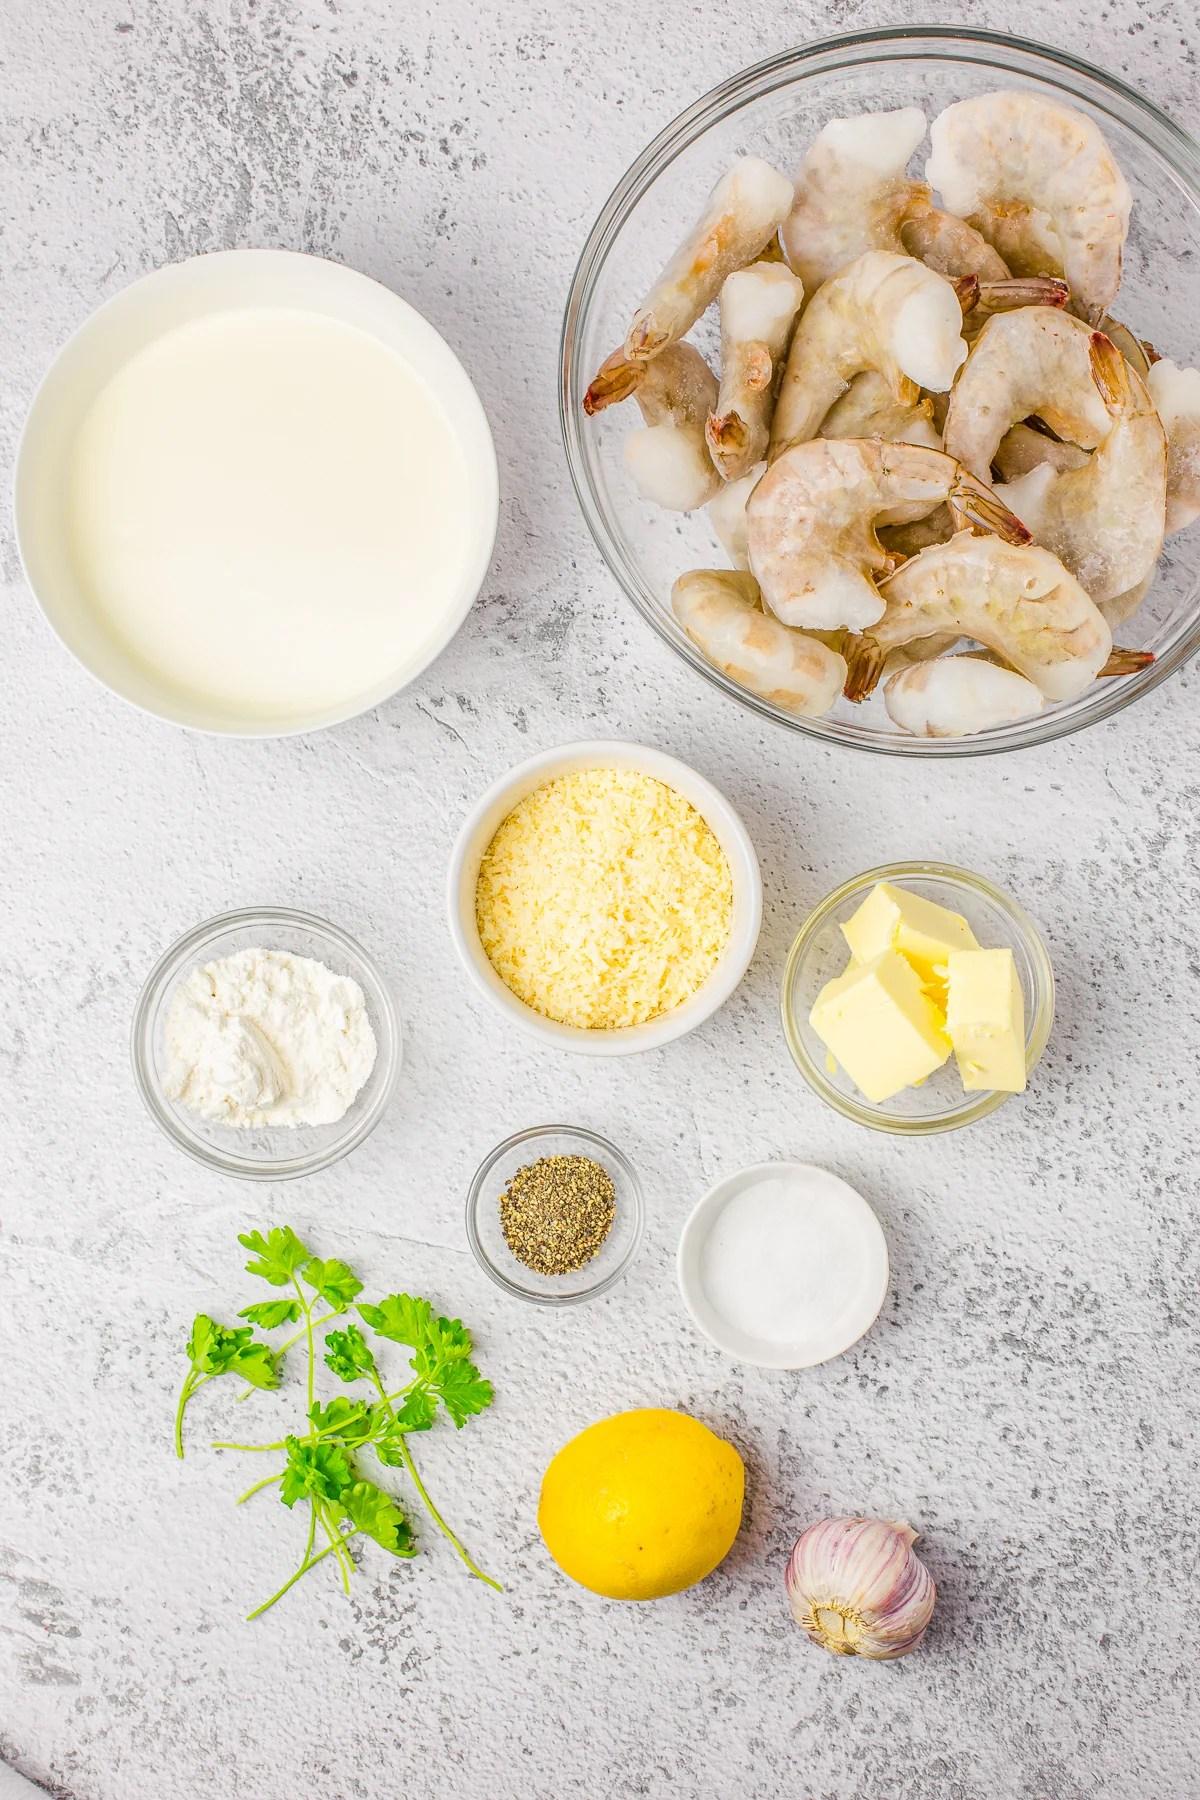 Ingredients needed to make Lemon Shrimp